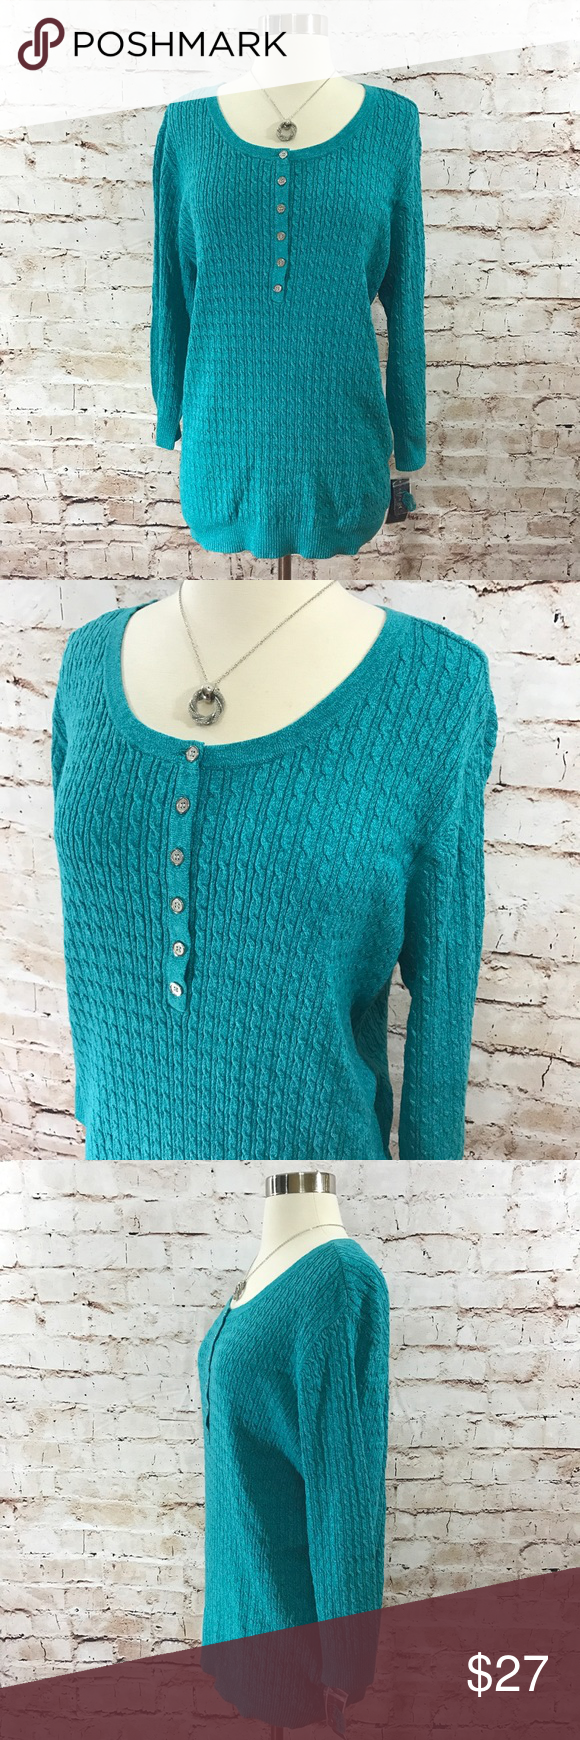 Karen Scott- Teal Knit Sweater NWT | Karen scott, Teal colors and ...